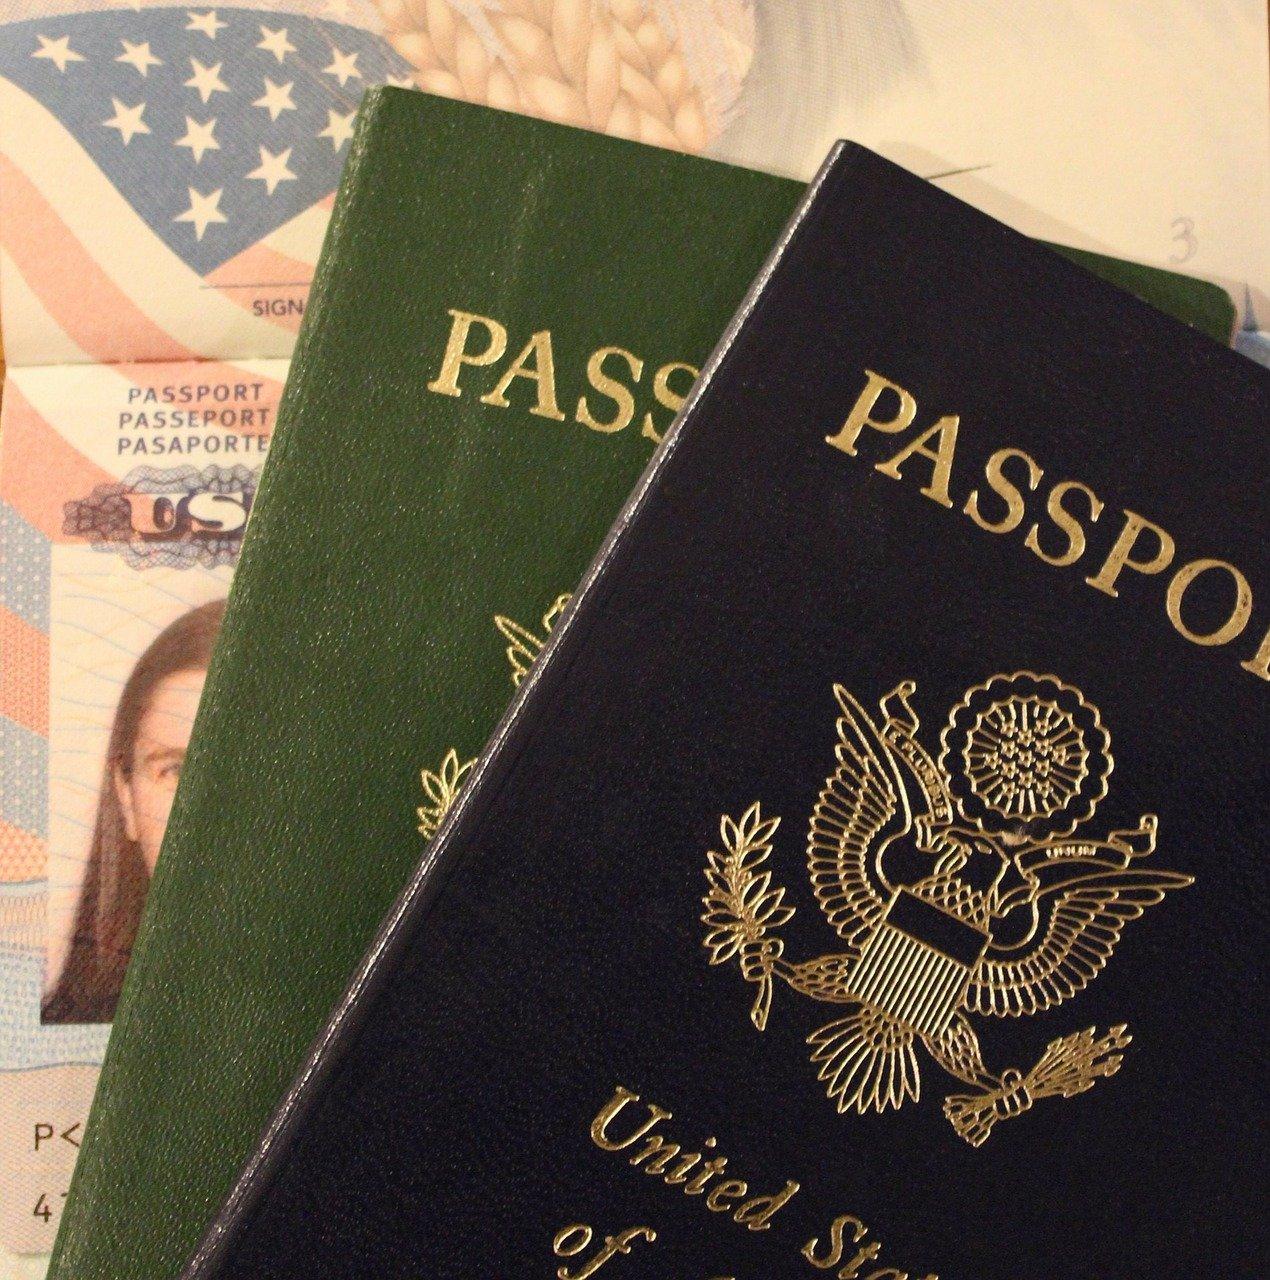 Federal judge blocks fee increases for proceedings to deport immigrants